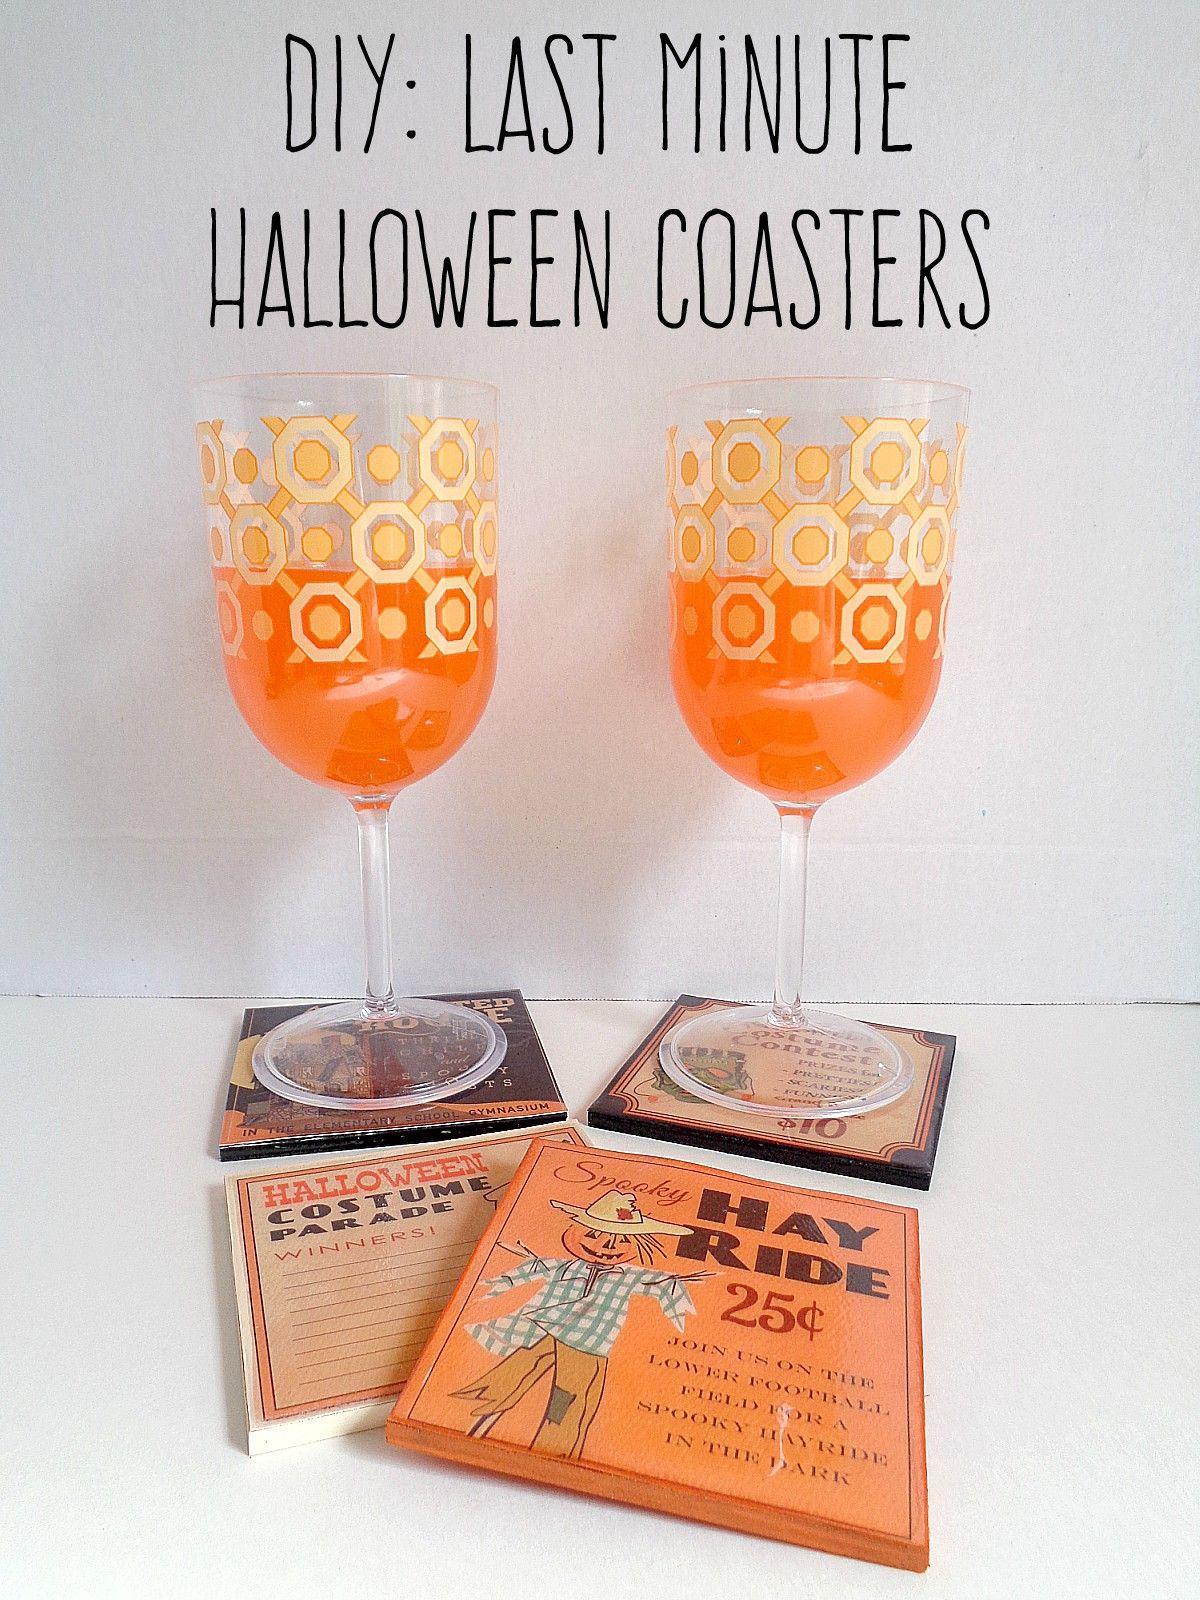 Diy last minute halloween coasters